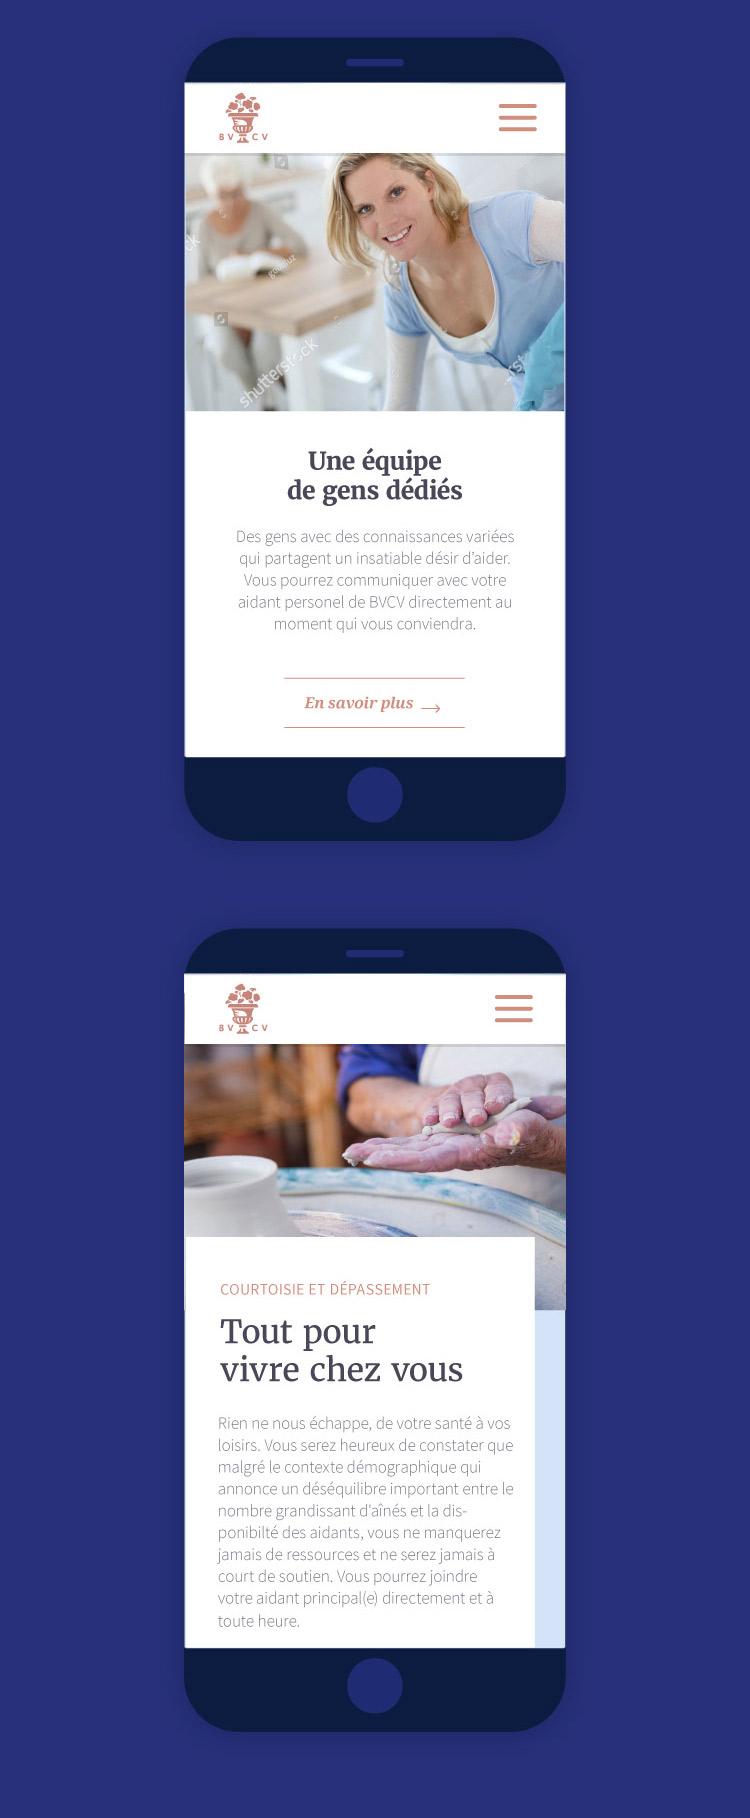 Senior home care service website design: mobile version